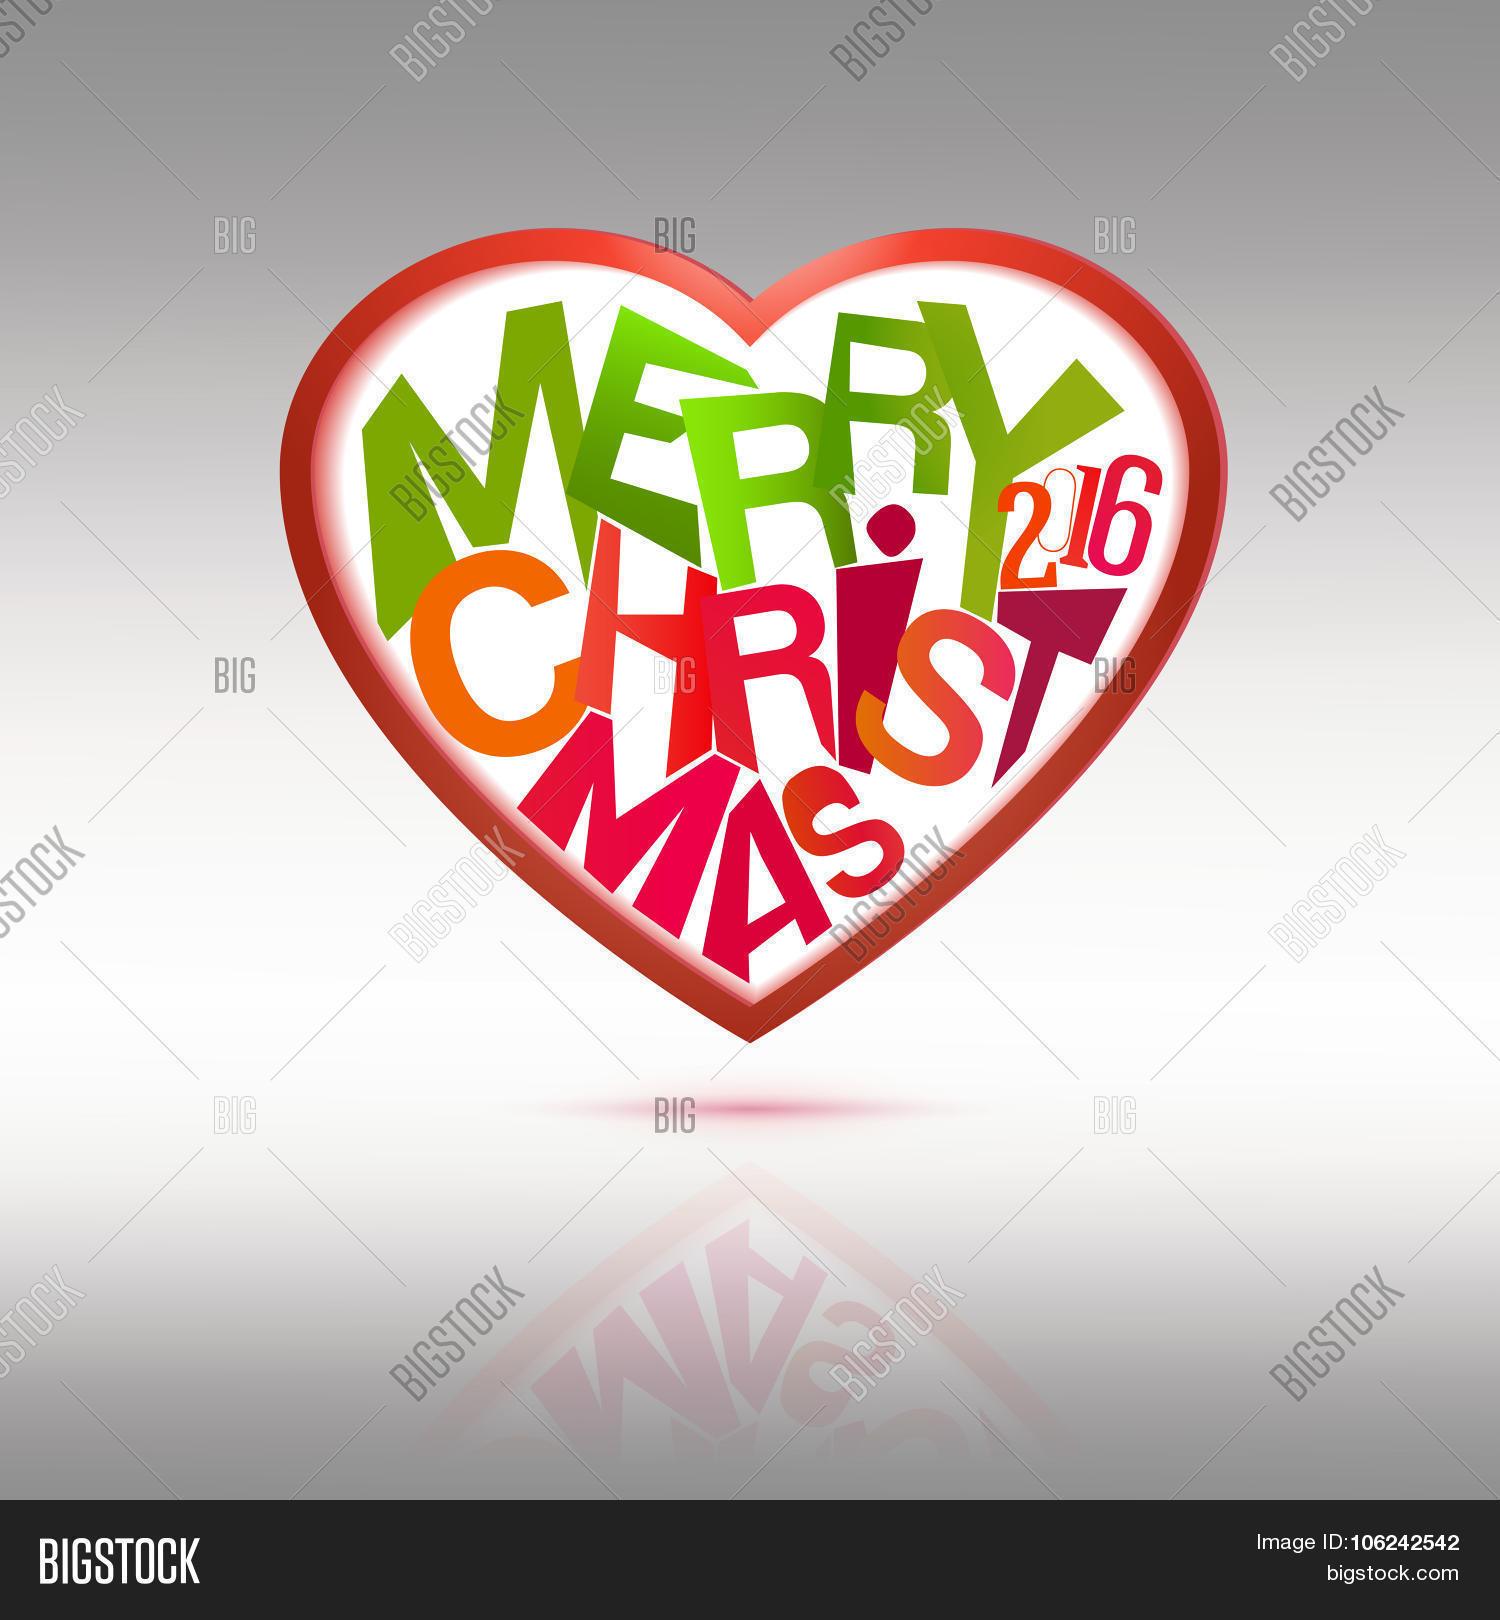 Christmas Heart Vector.Merry Christmas Heart Vector Photo Free Trial Bigstock